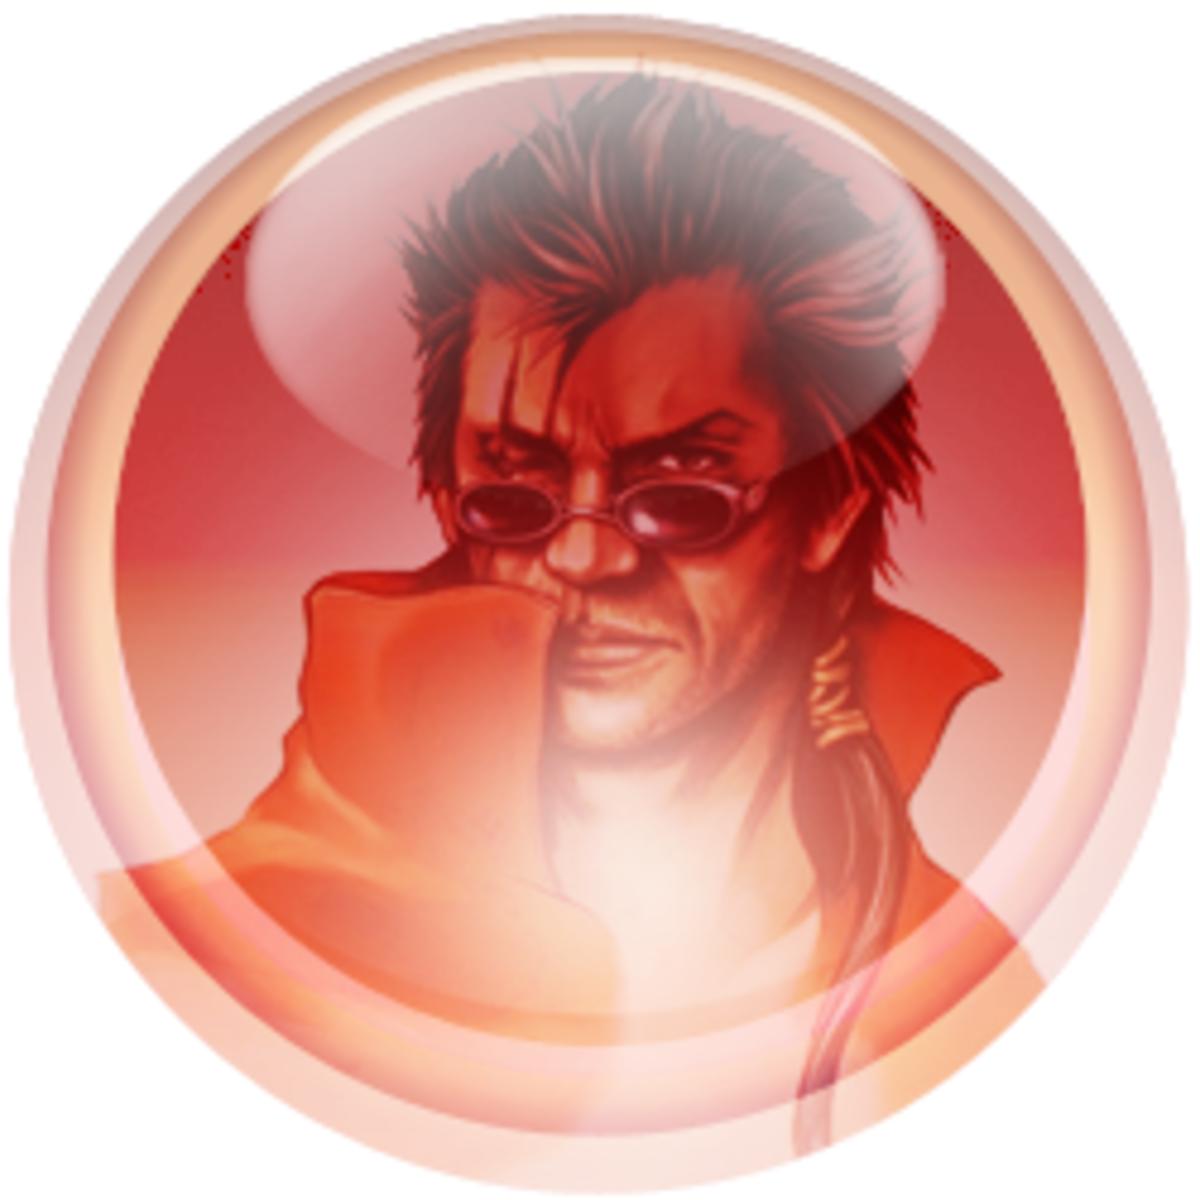 Auron: Masamune